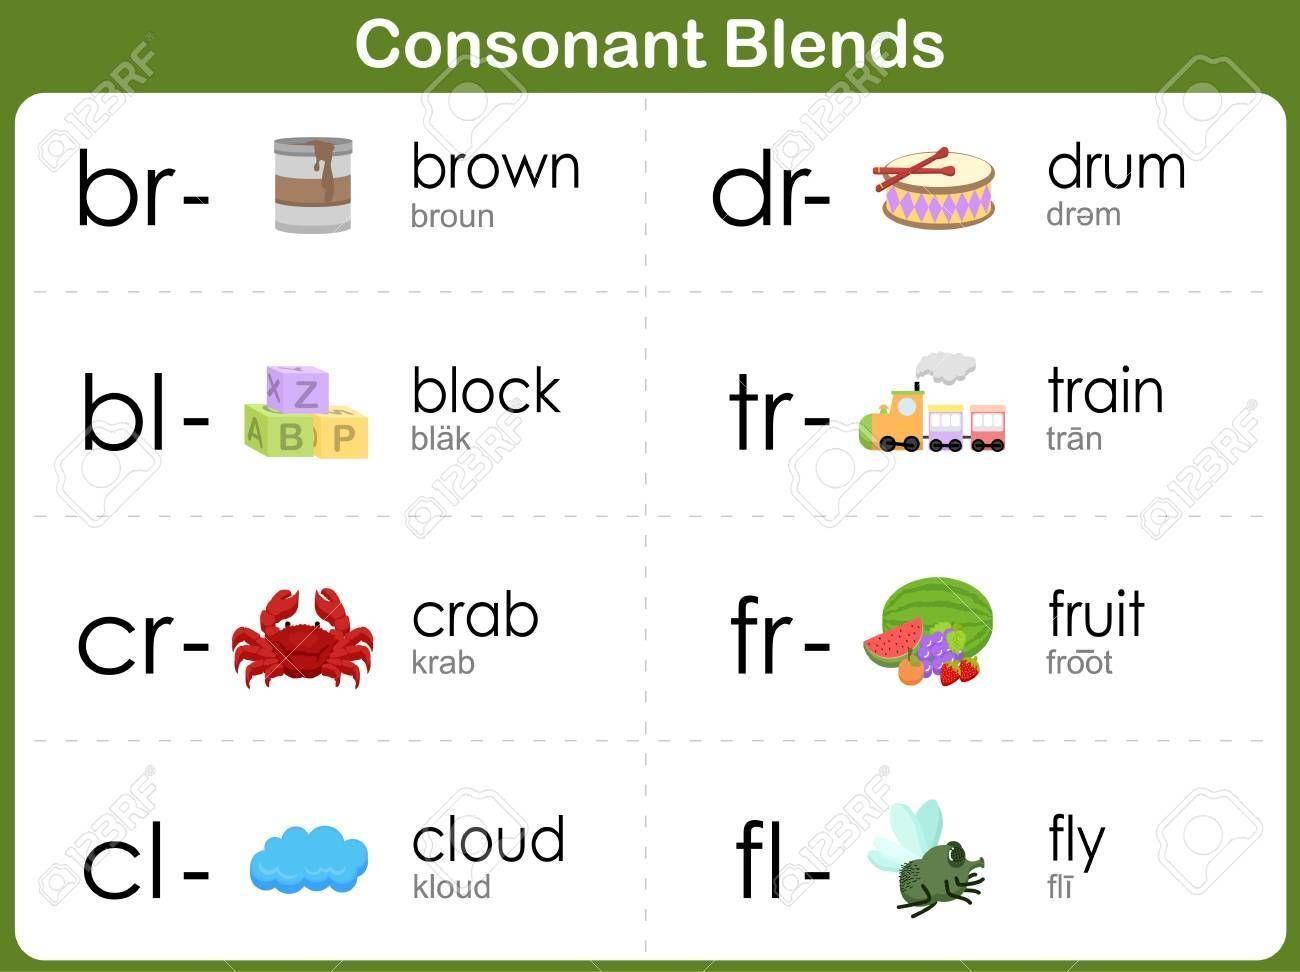 Consonant Blends In Consonant Consonant Blends In